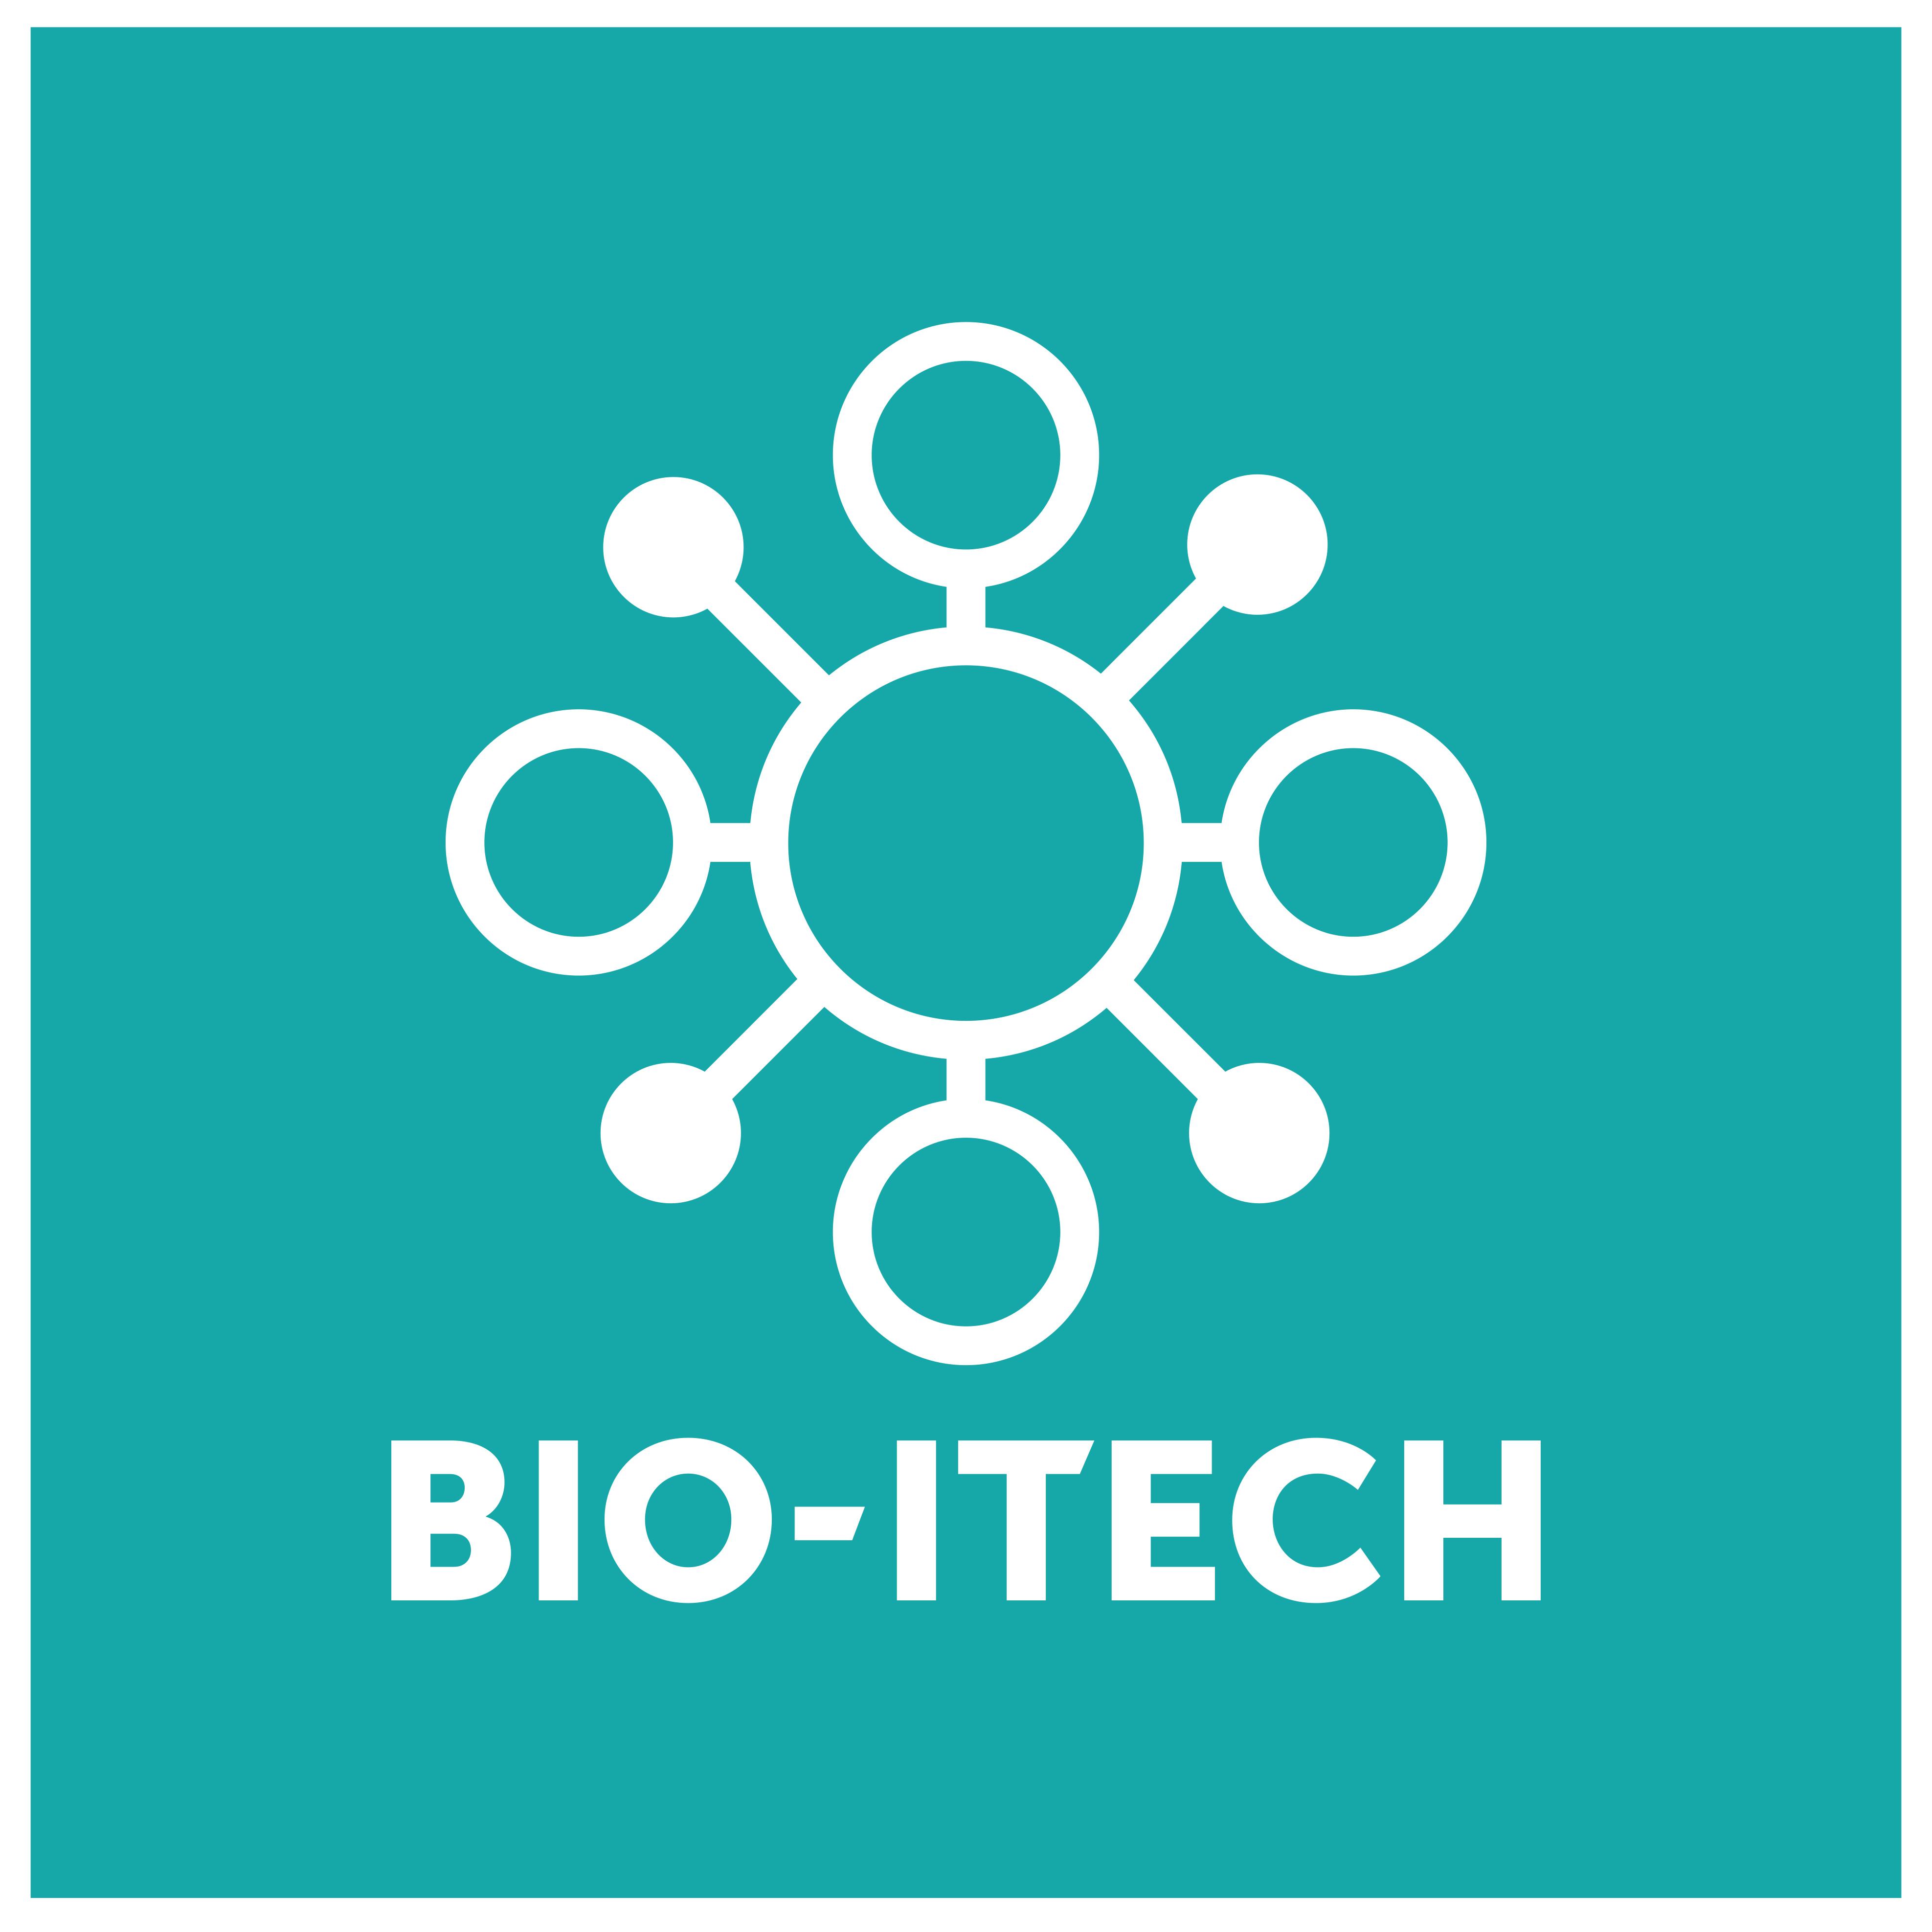 Bio-itech-logo.jpg